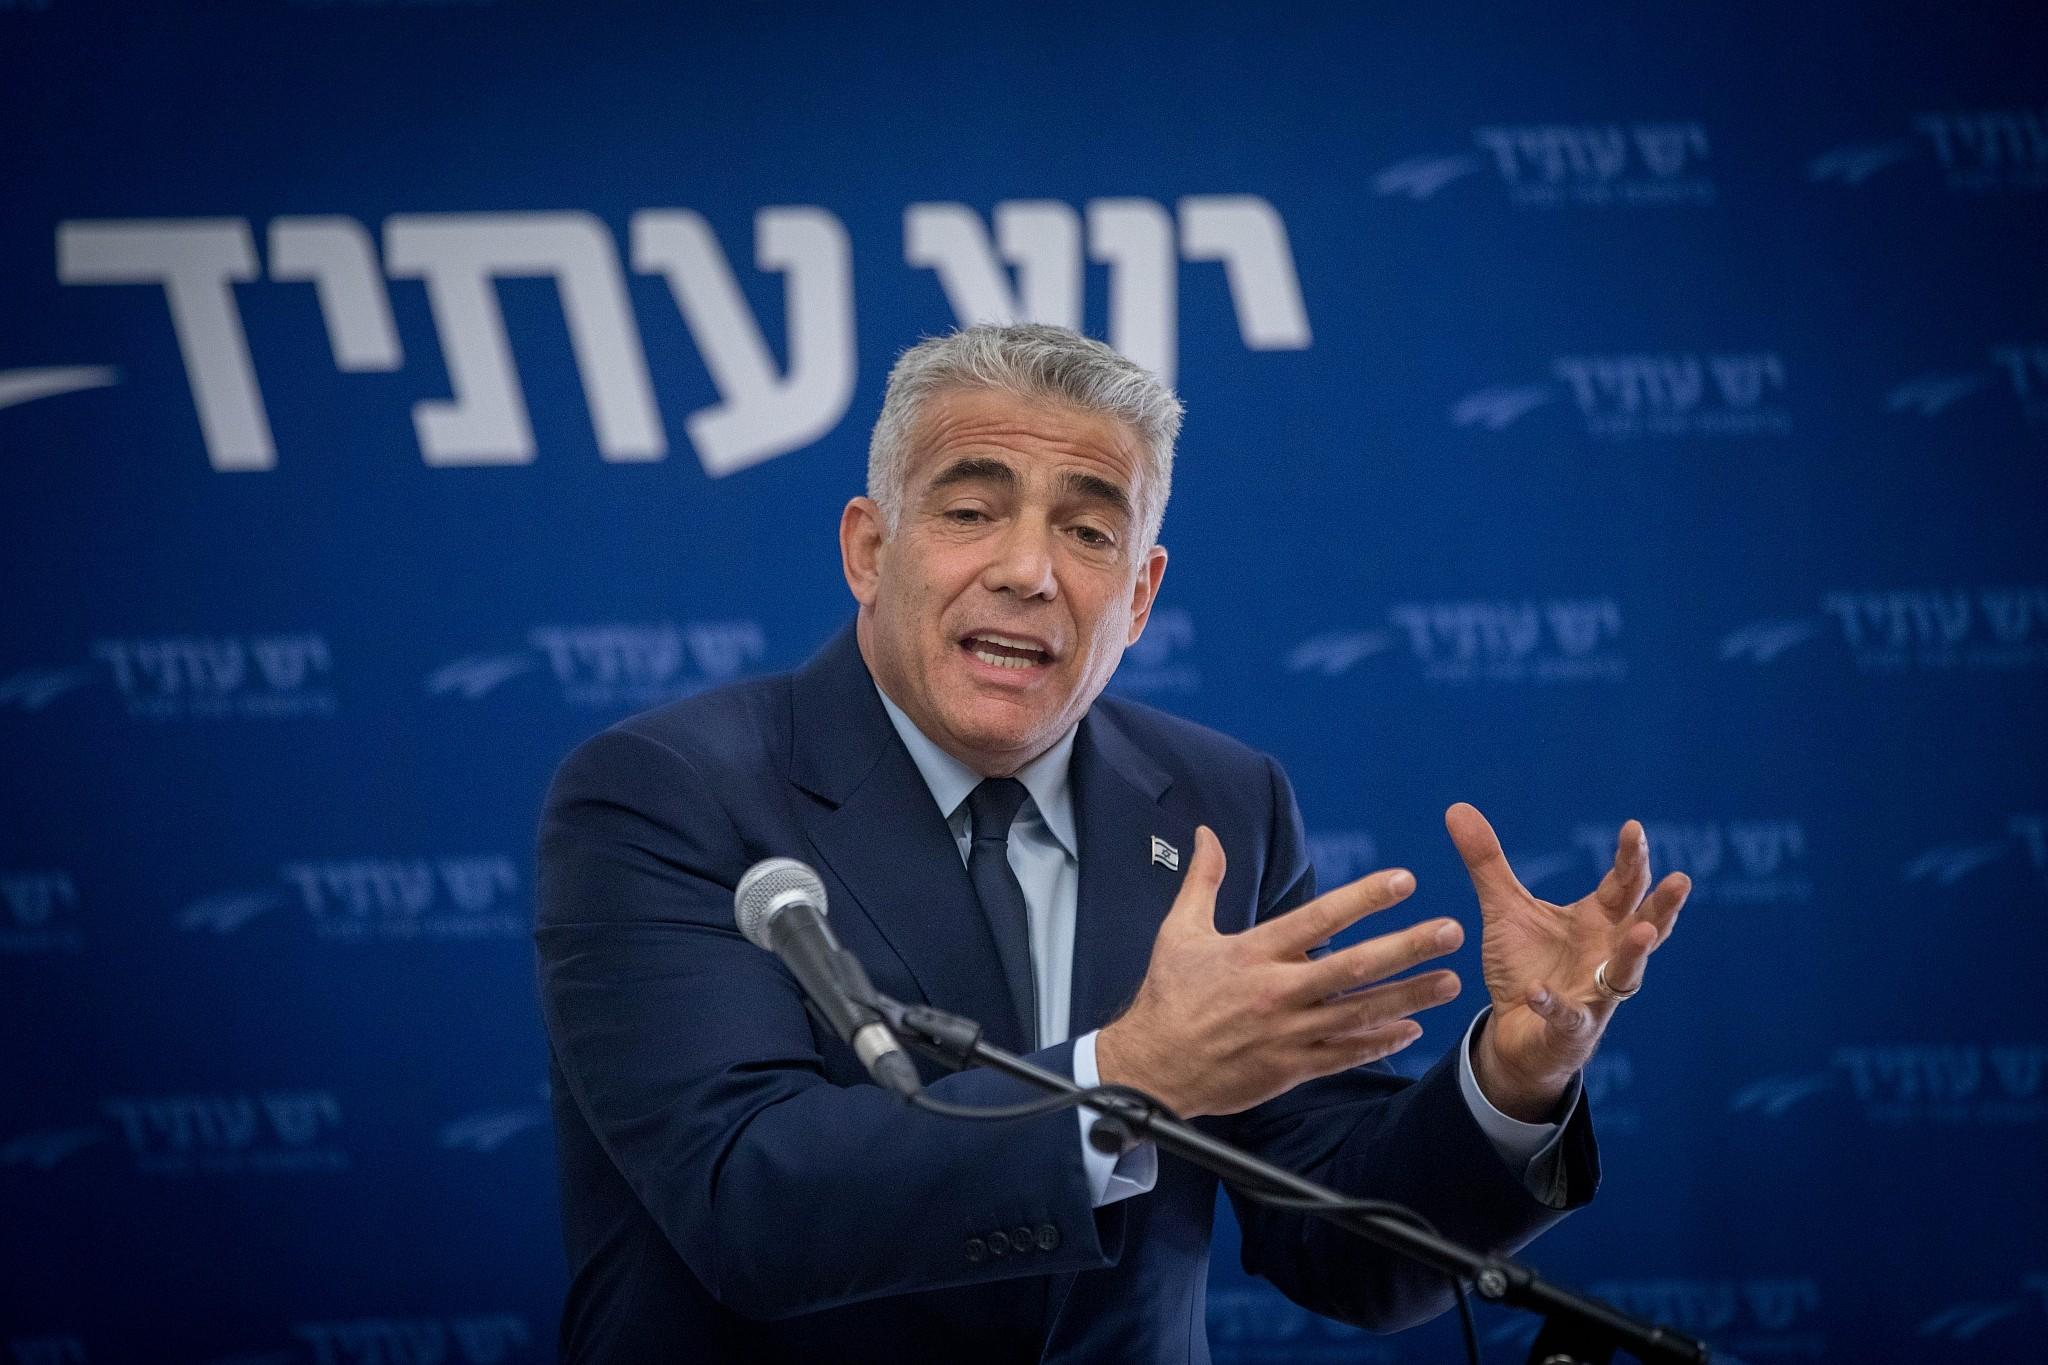 Israel's health minister resigns over Sabbath train work